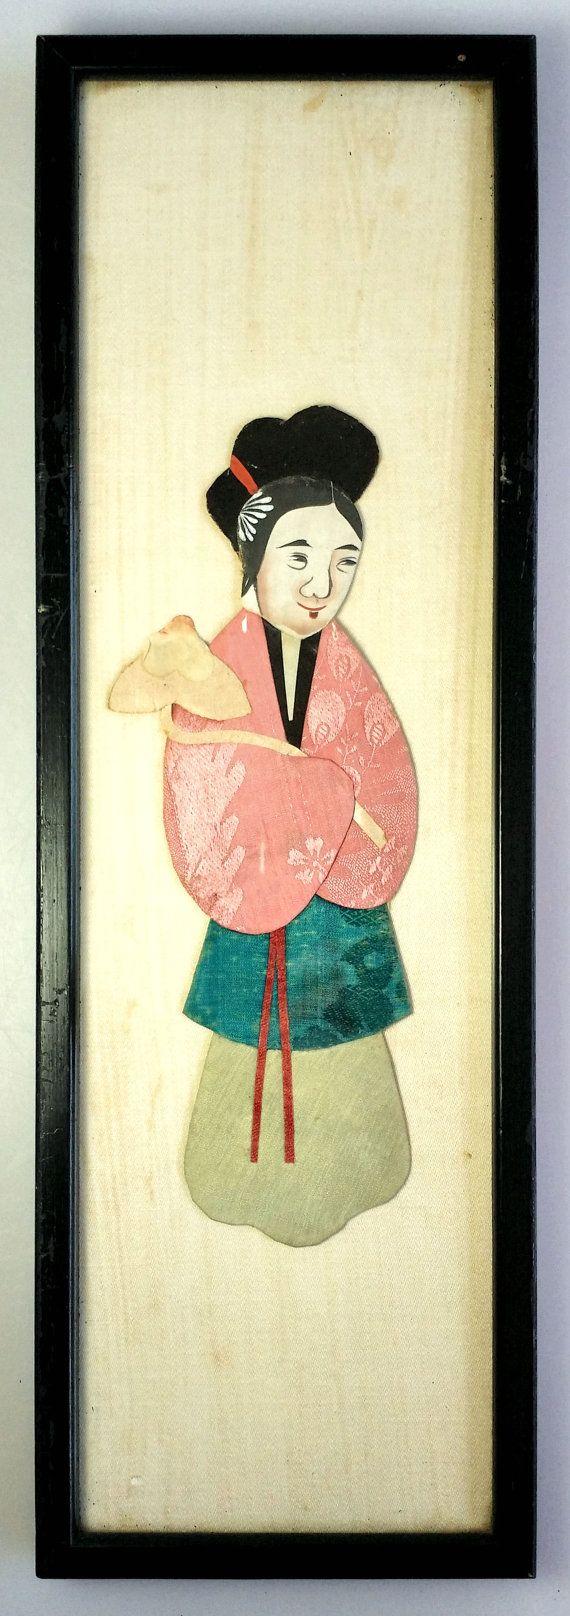 384 best Oriental Motif images on Pinterest   Oriental, Spy and Blue ...